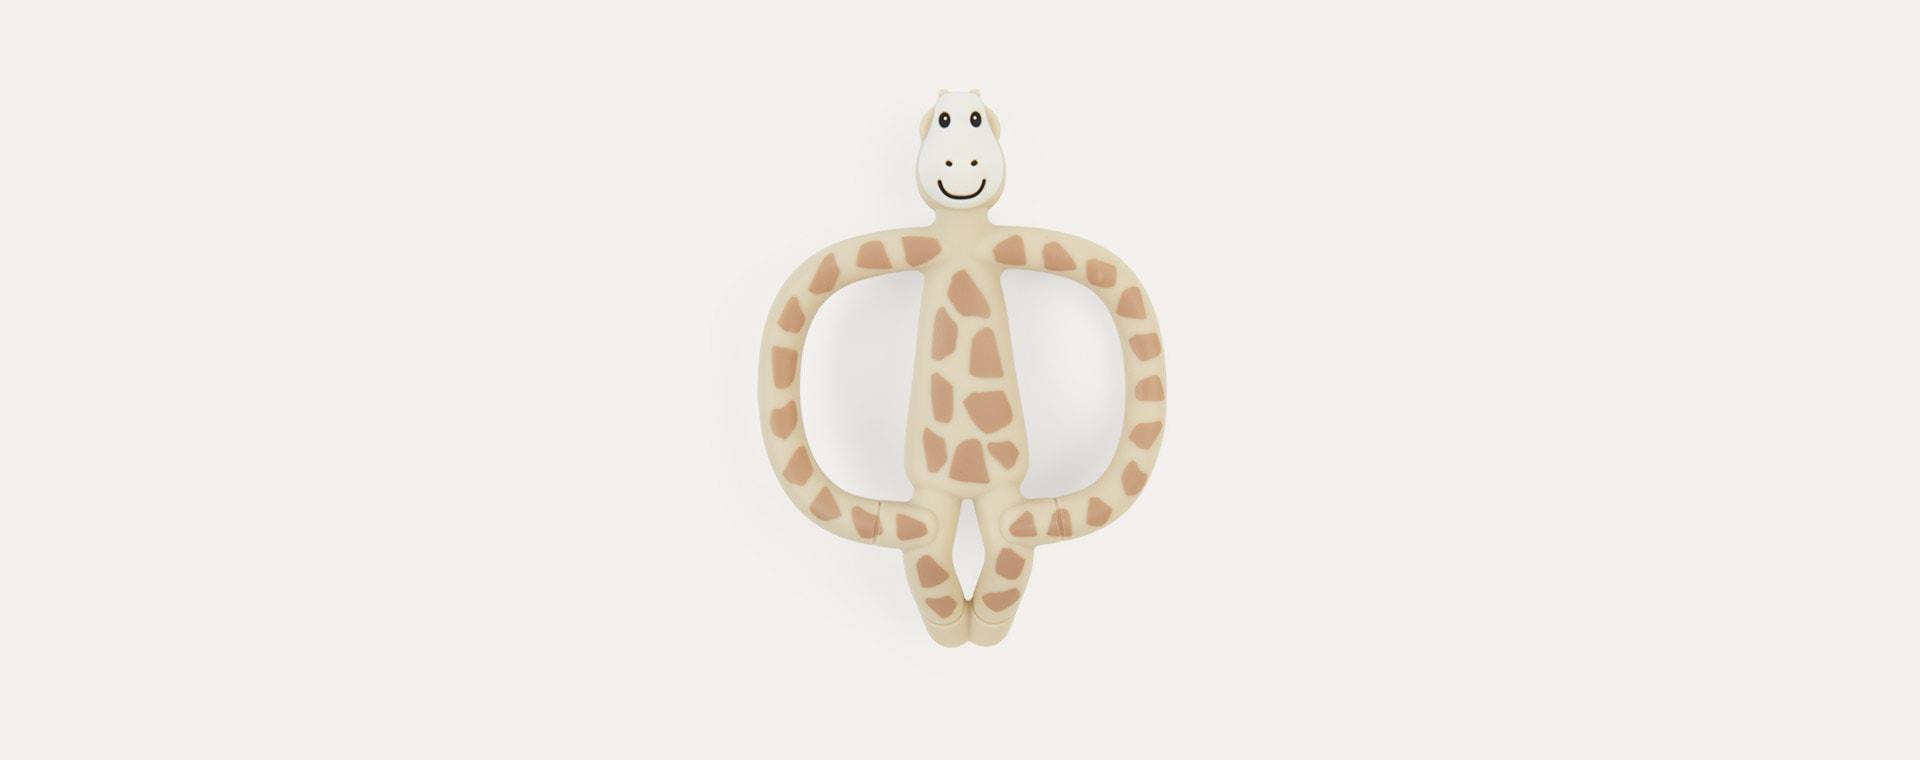 Giraffe Matchstick Monkey Animal Teether